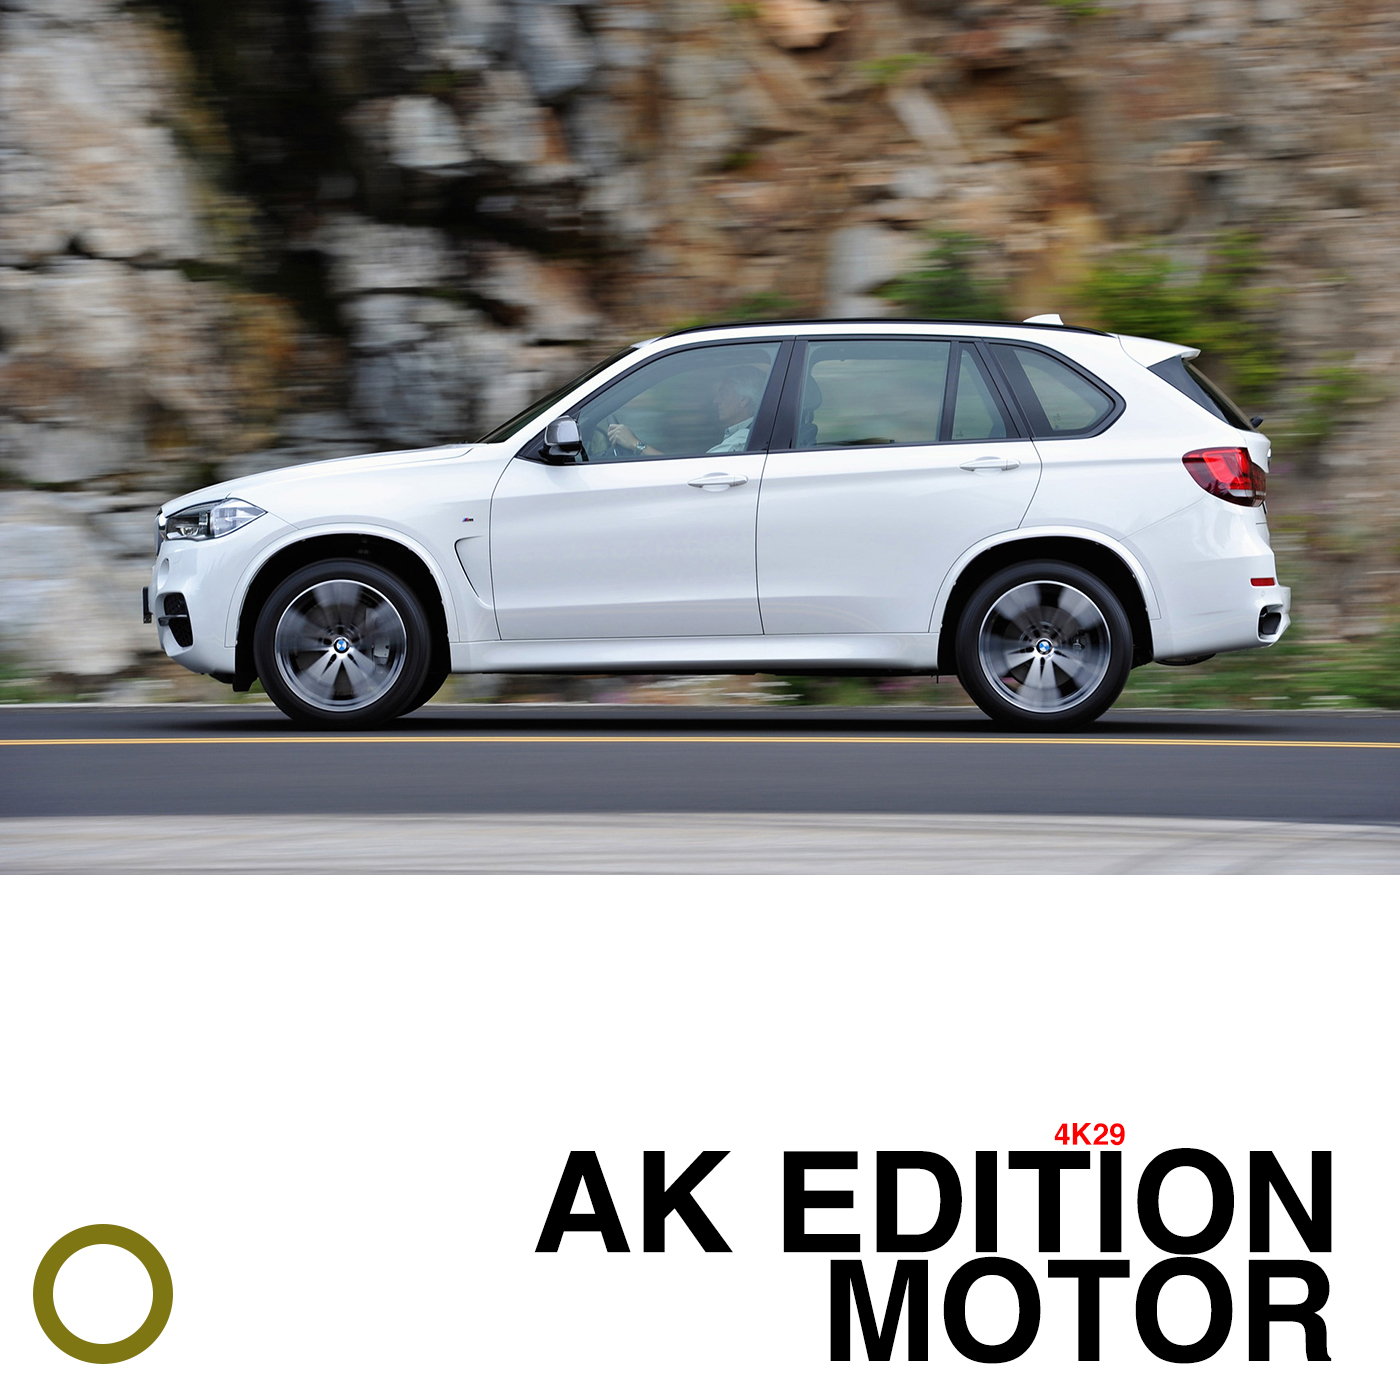 AK EDITION MOTOR 4K29